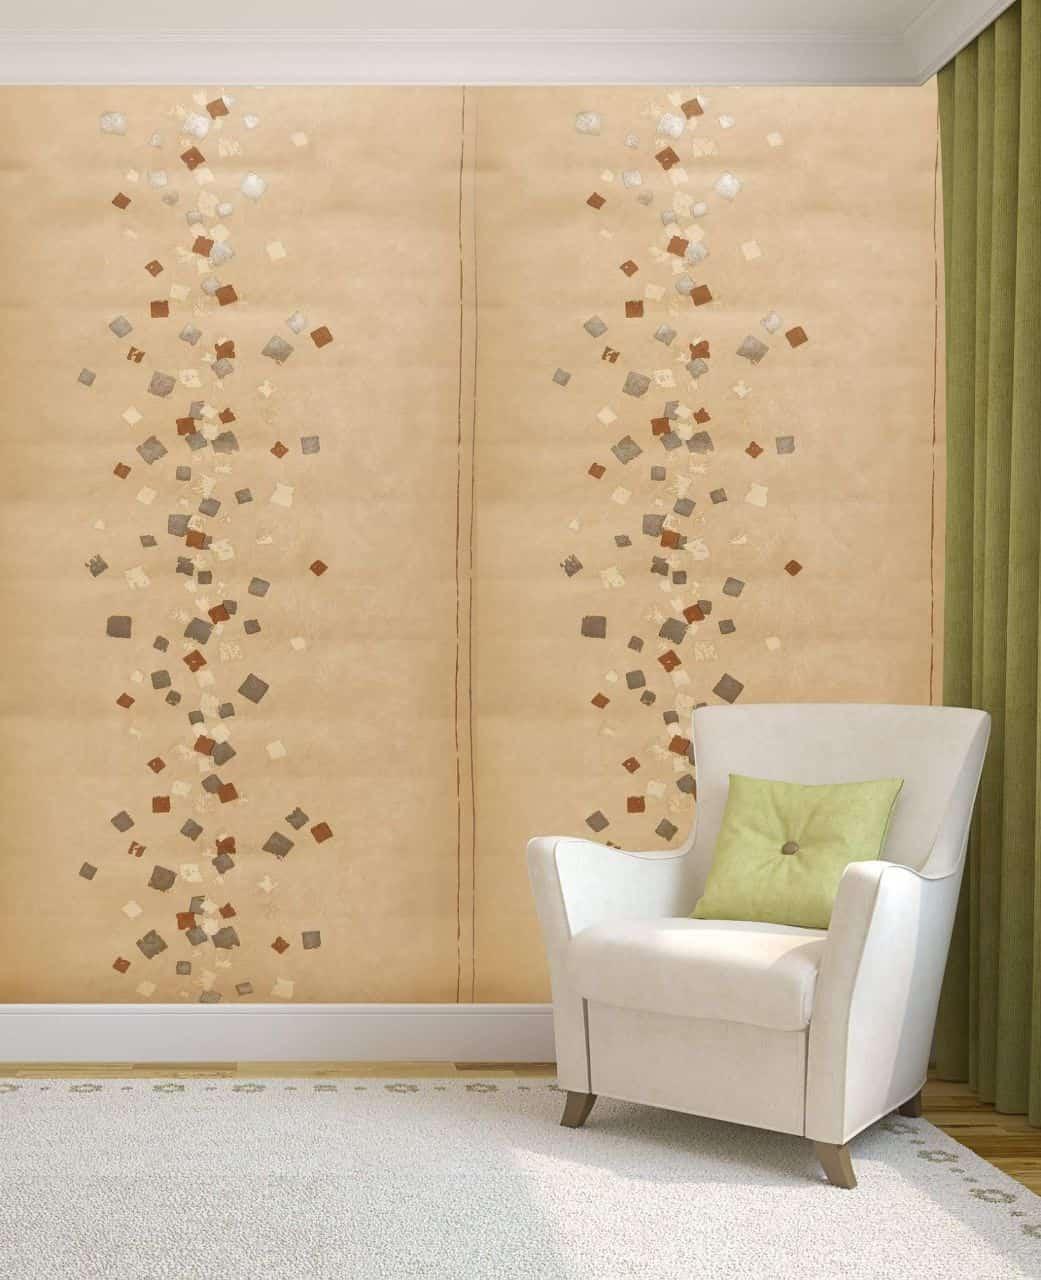 Art Deco Interiors, Nipani - Wall Paper Dealers in Belgaum - Justdial